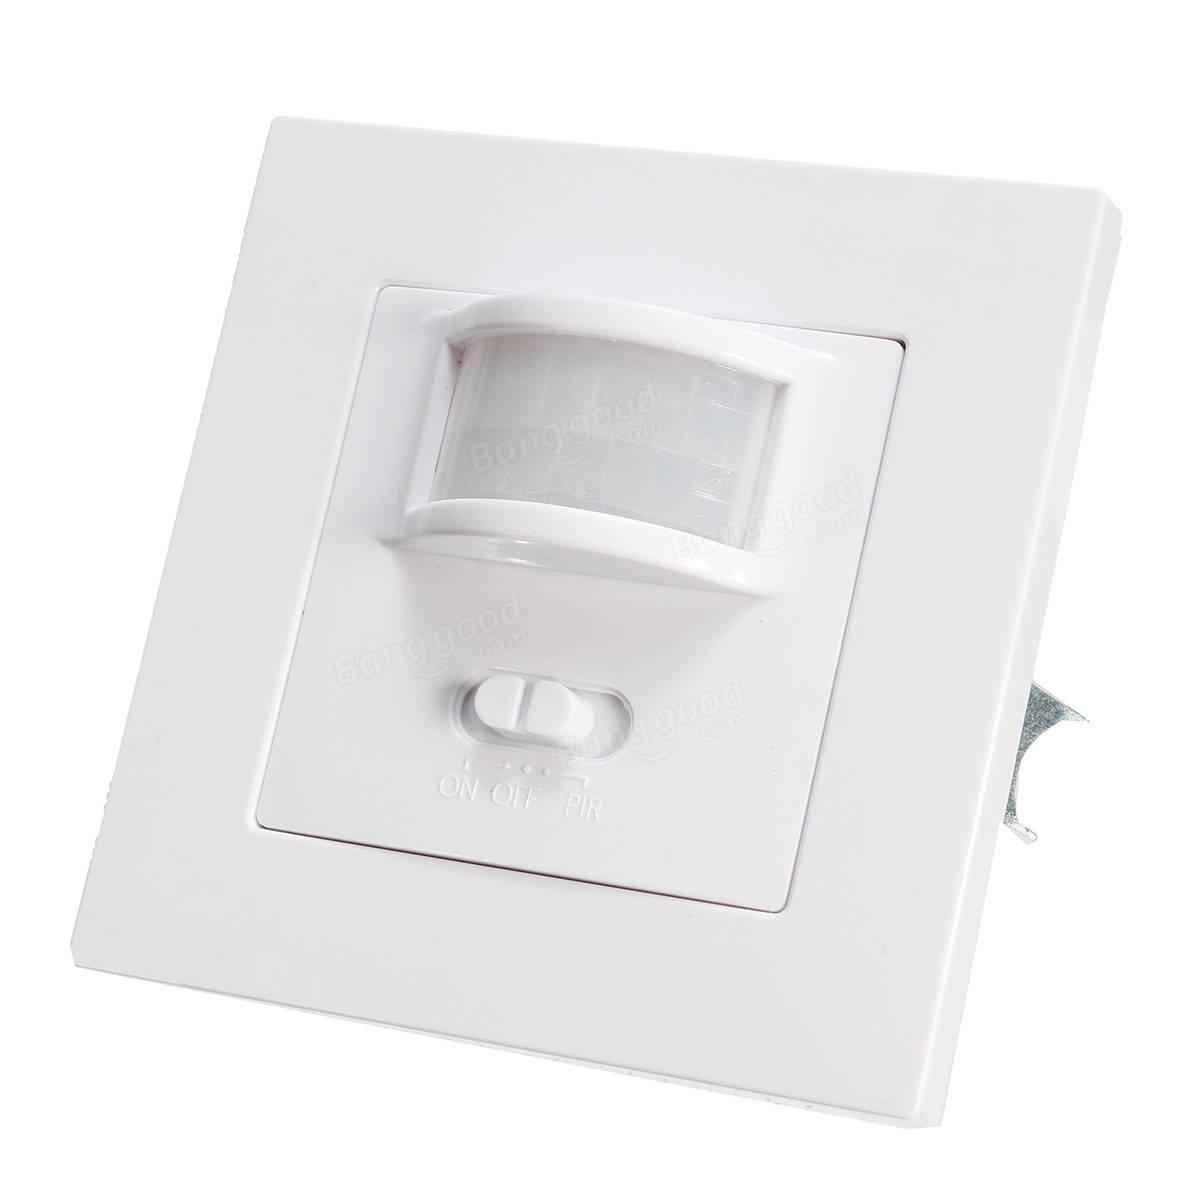 140 degree infrared pir motion sensor recessed wall lamp bulb led strip light switch ac220 240v. Black Bedroom Furniture Sets. Home Design Ideas